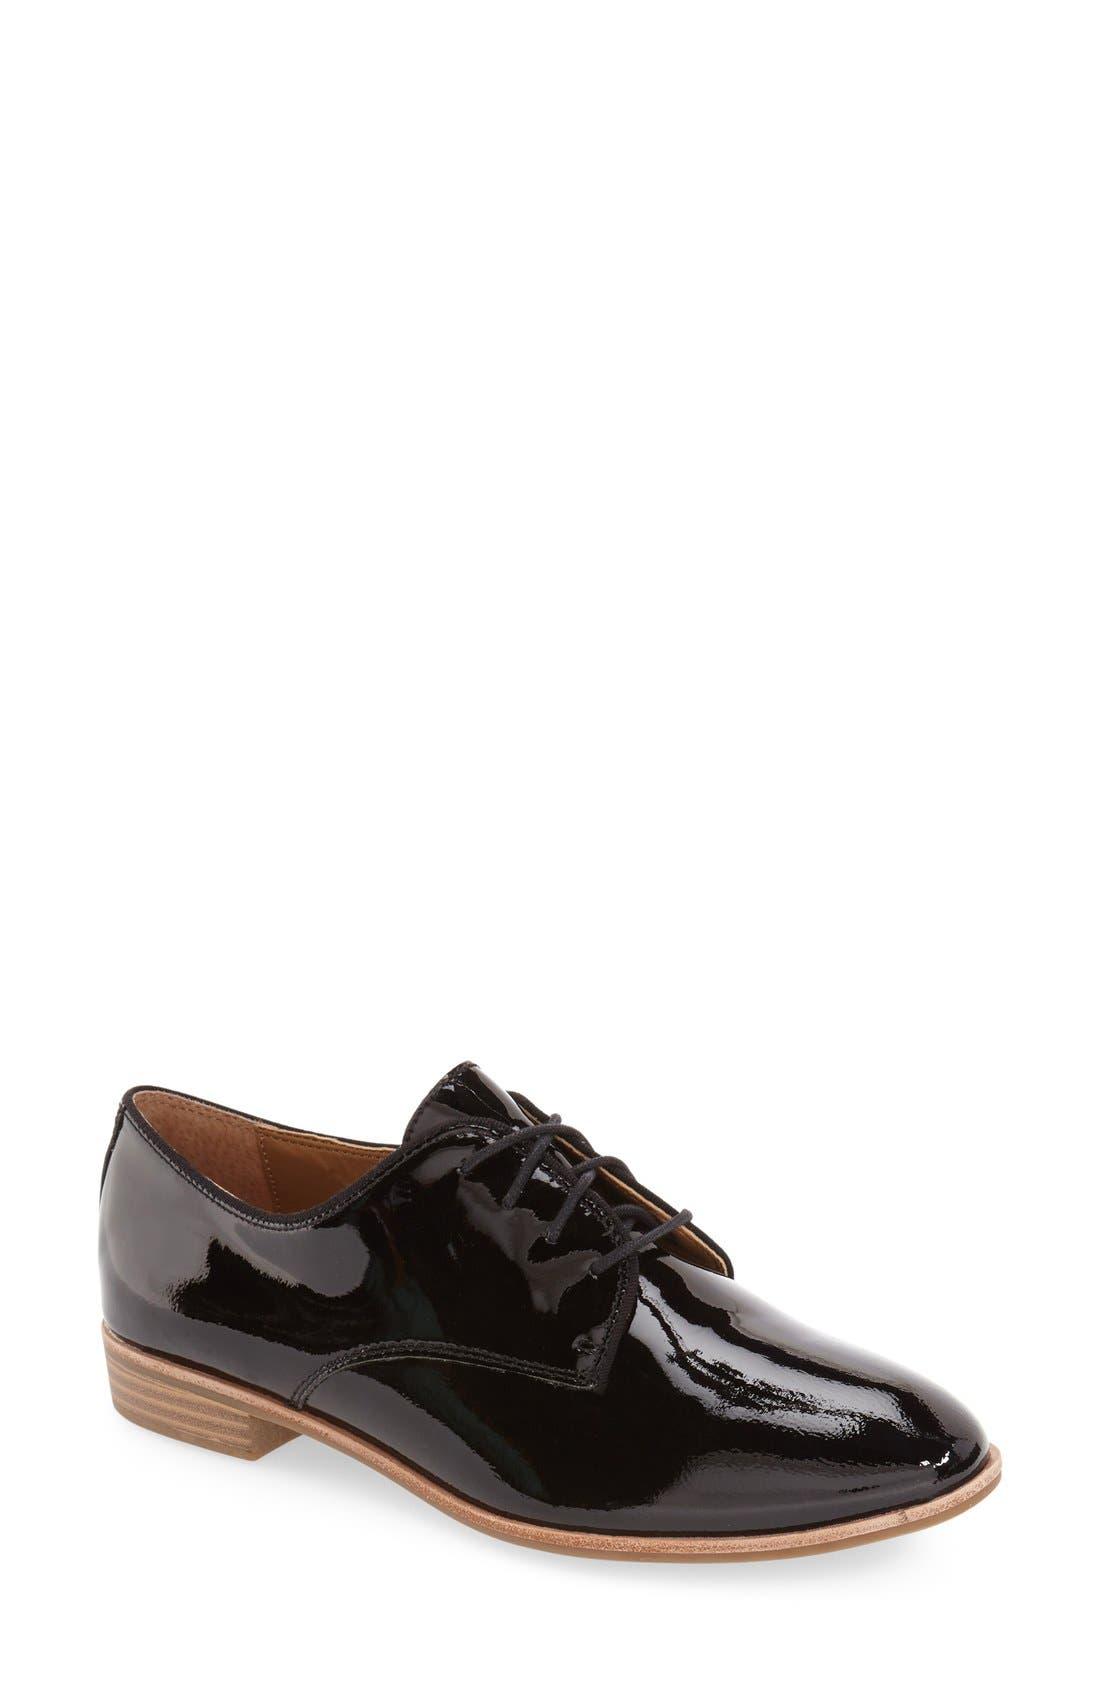 G.H. BASS & CO. 'Ella' Leather Oxford, Main, color, 001